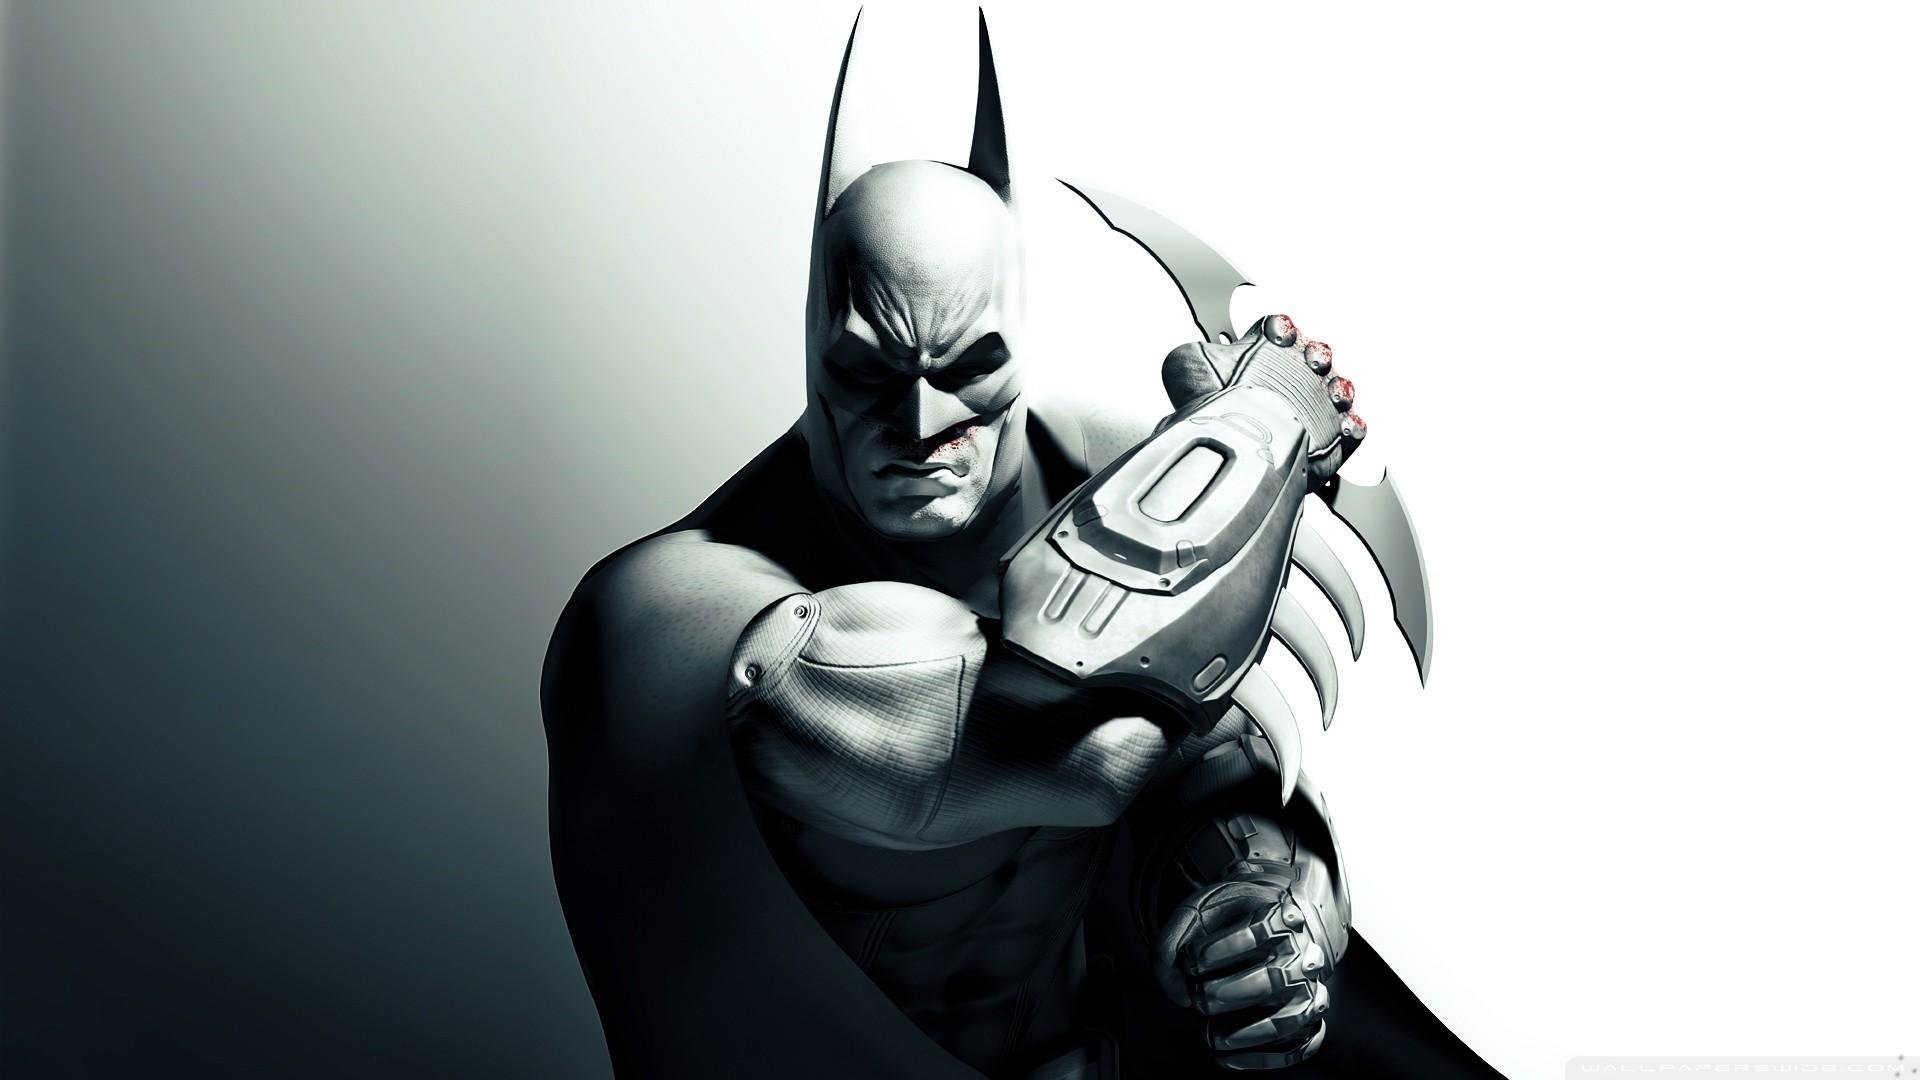 Batman Mask 4K Ultra Hd Wallpaper | HD Wallpapers